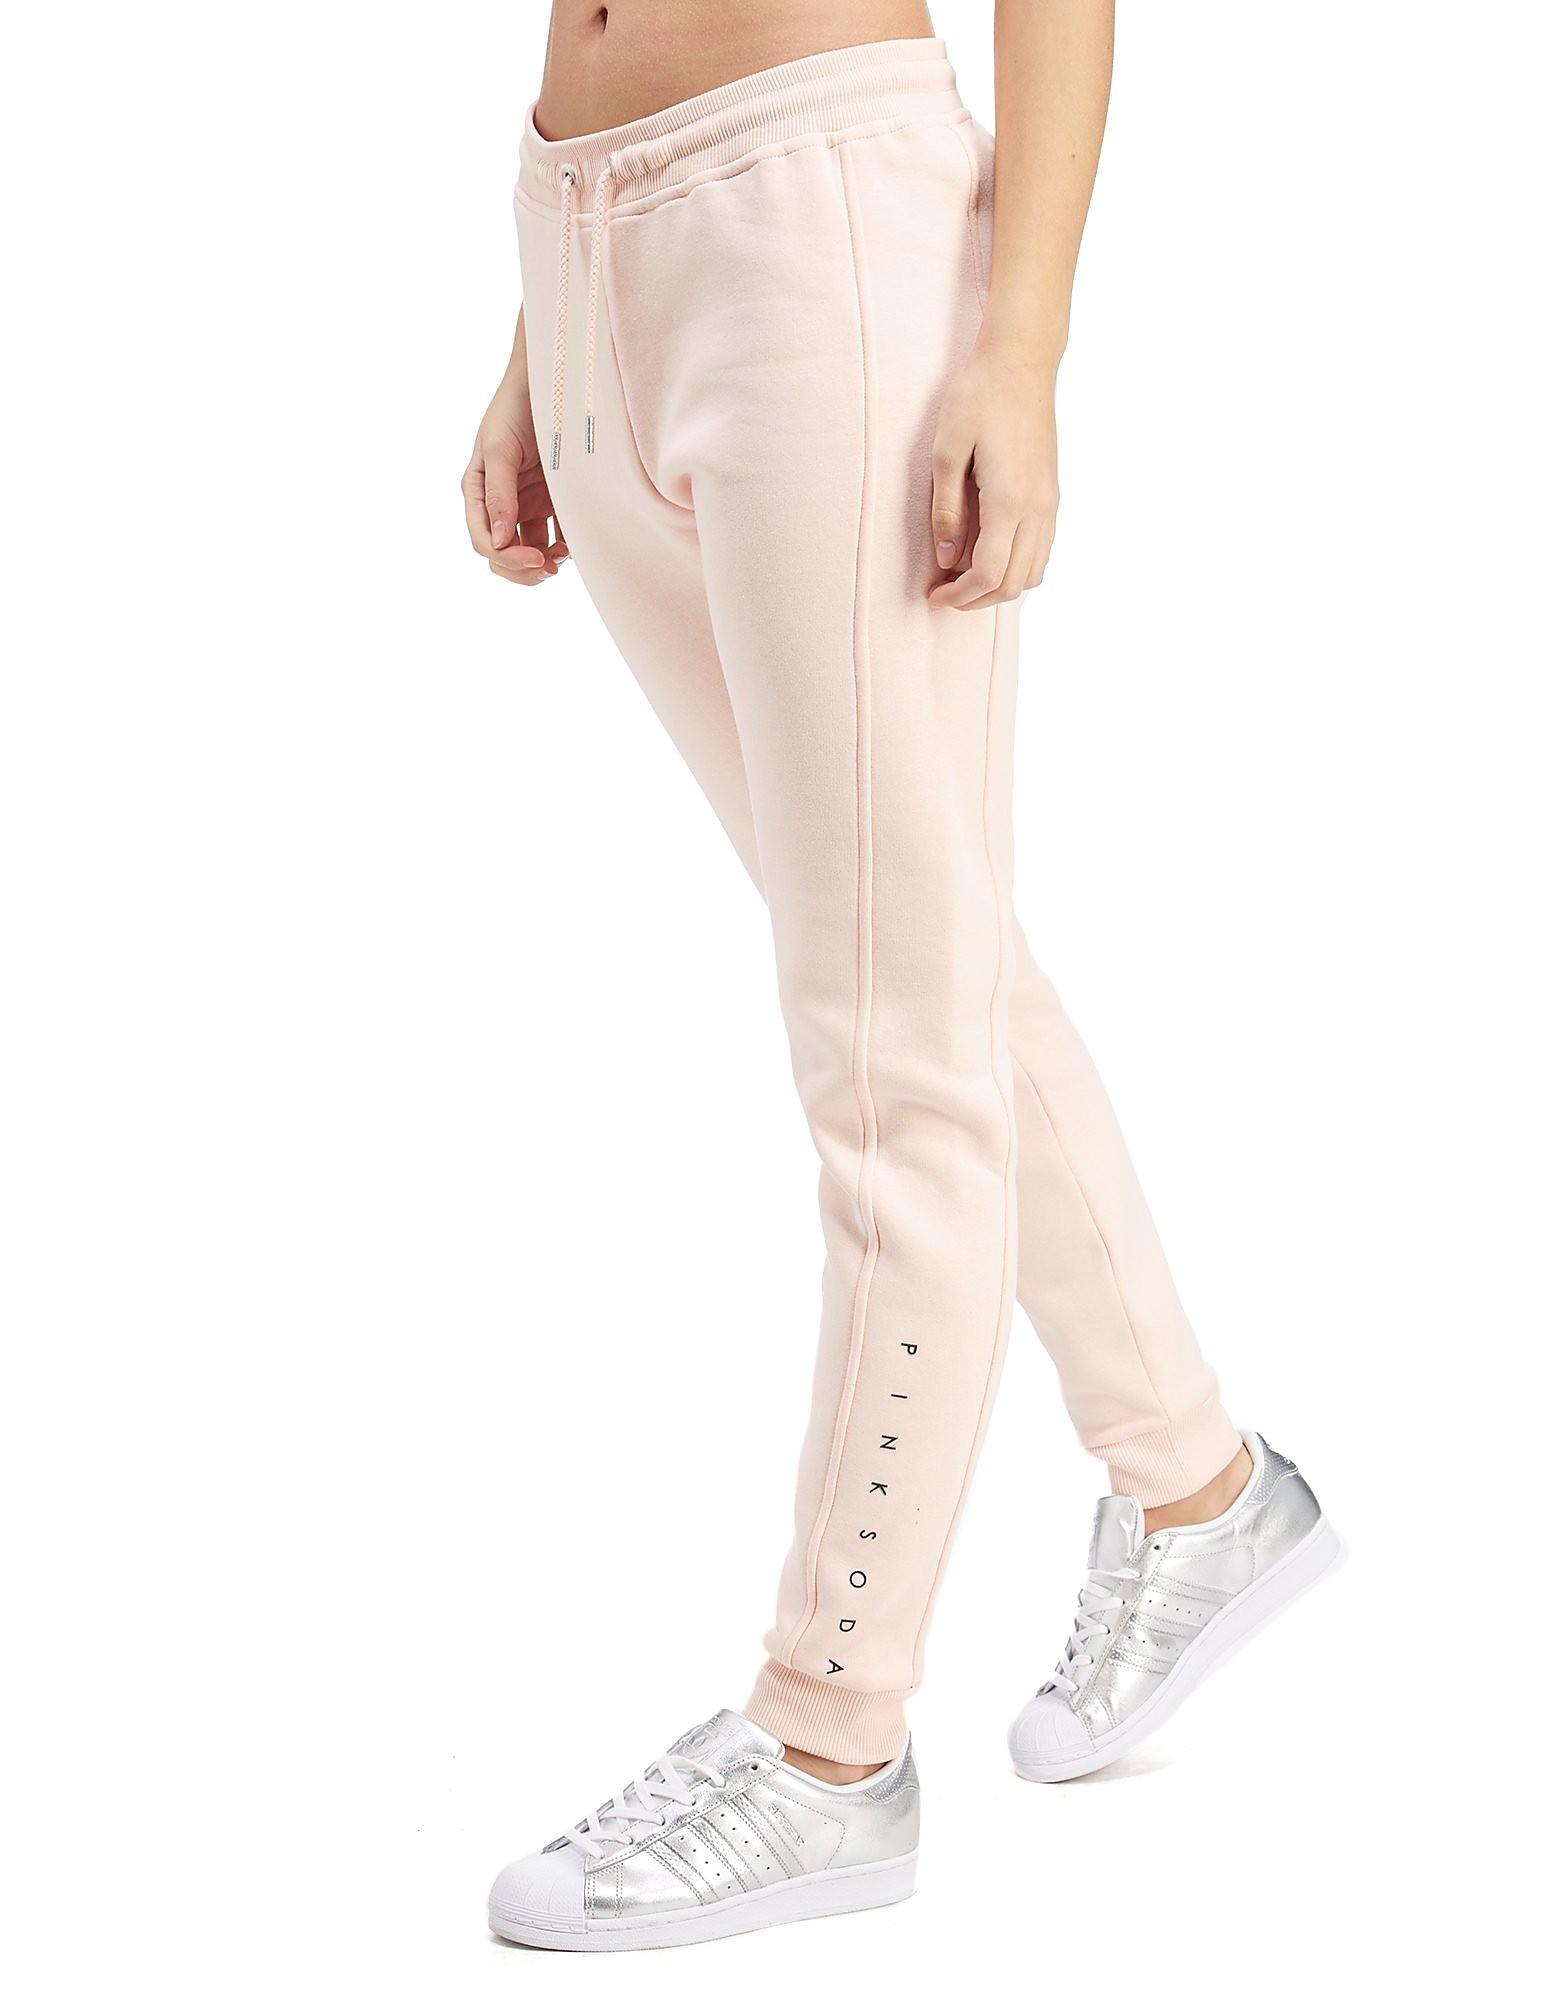 Pink Soda Sport Skinny Fit Jogging Pants